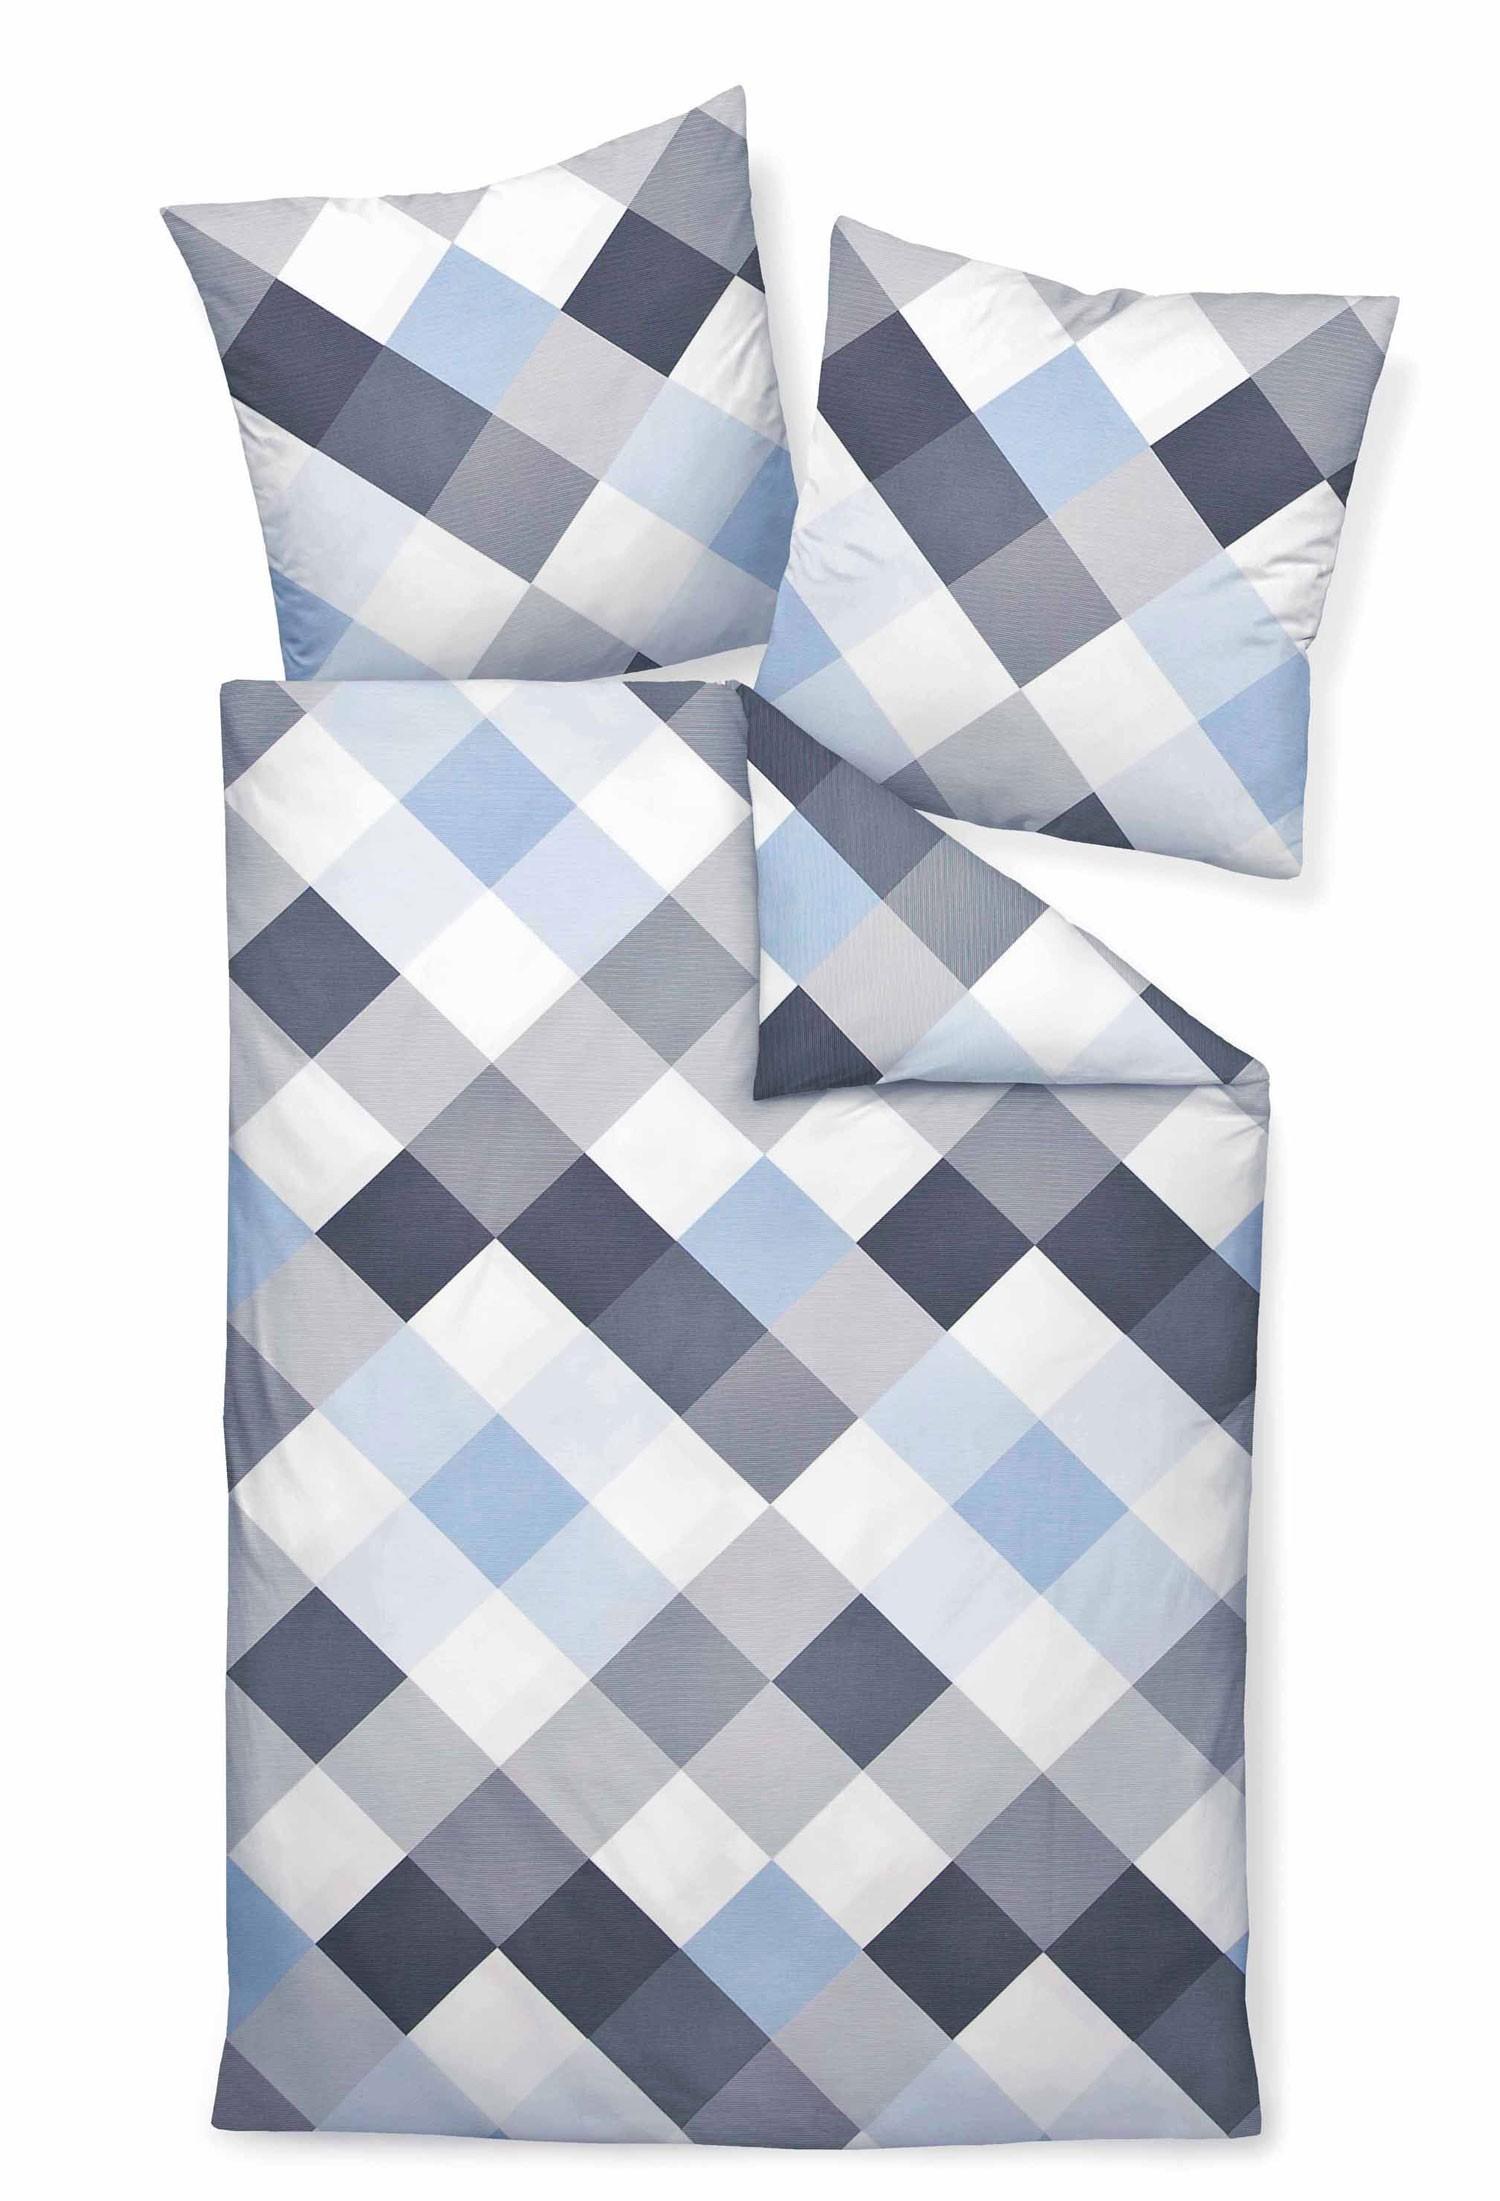 bettw sche janine moments 98010 grau blau. Black Bedroom Furniture Sets. Home Design Ideas